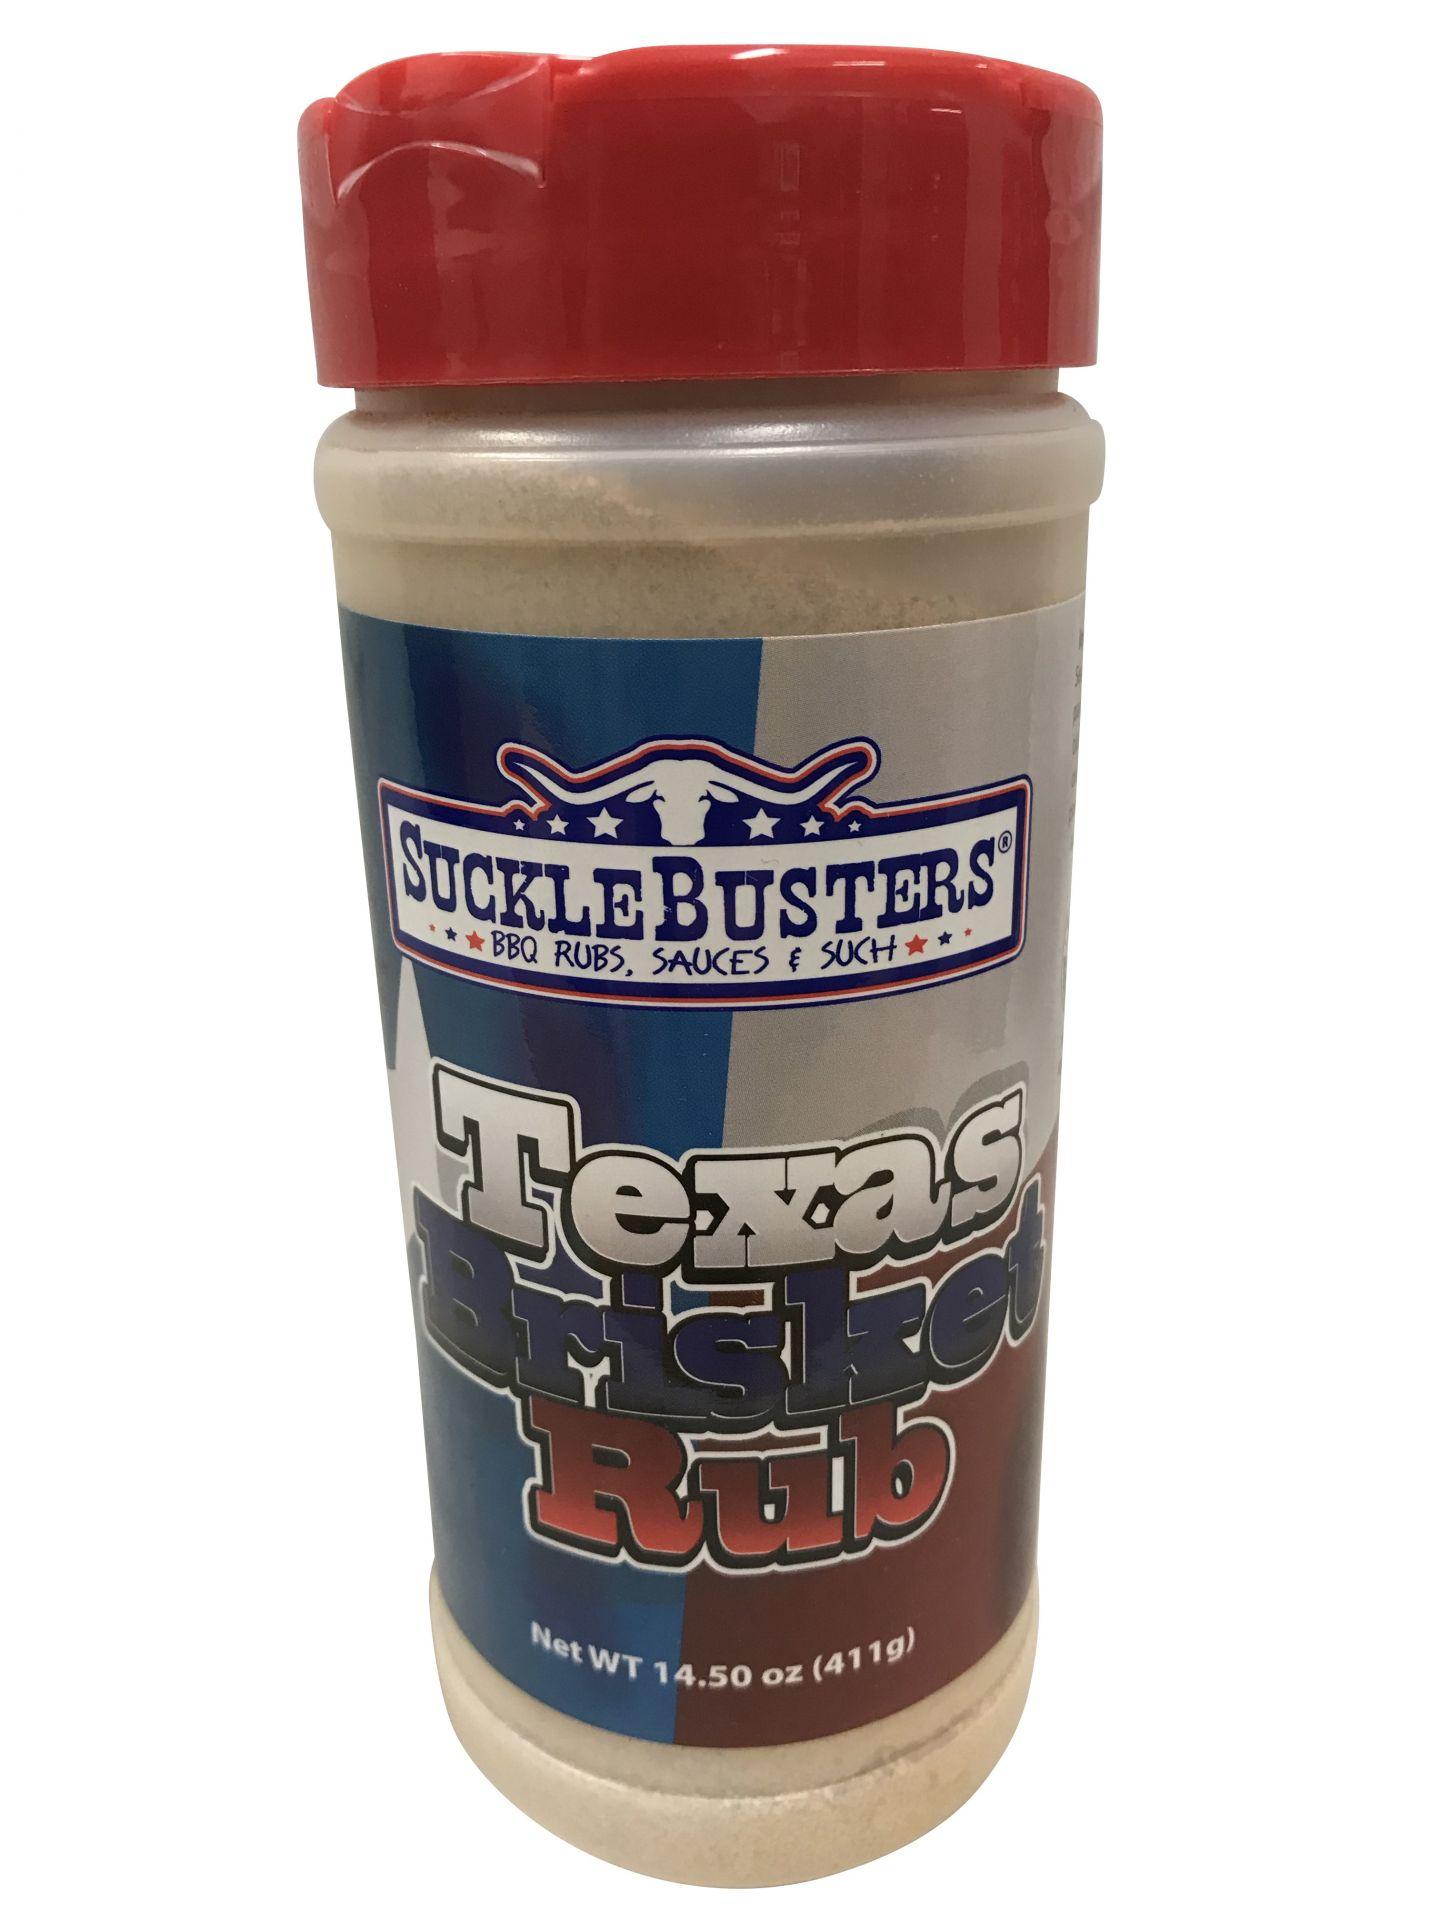 Suckle Busters Texas Brisket Rub 411g